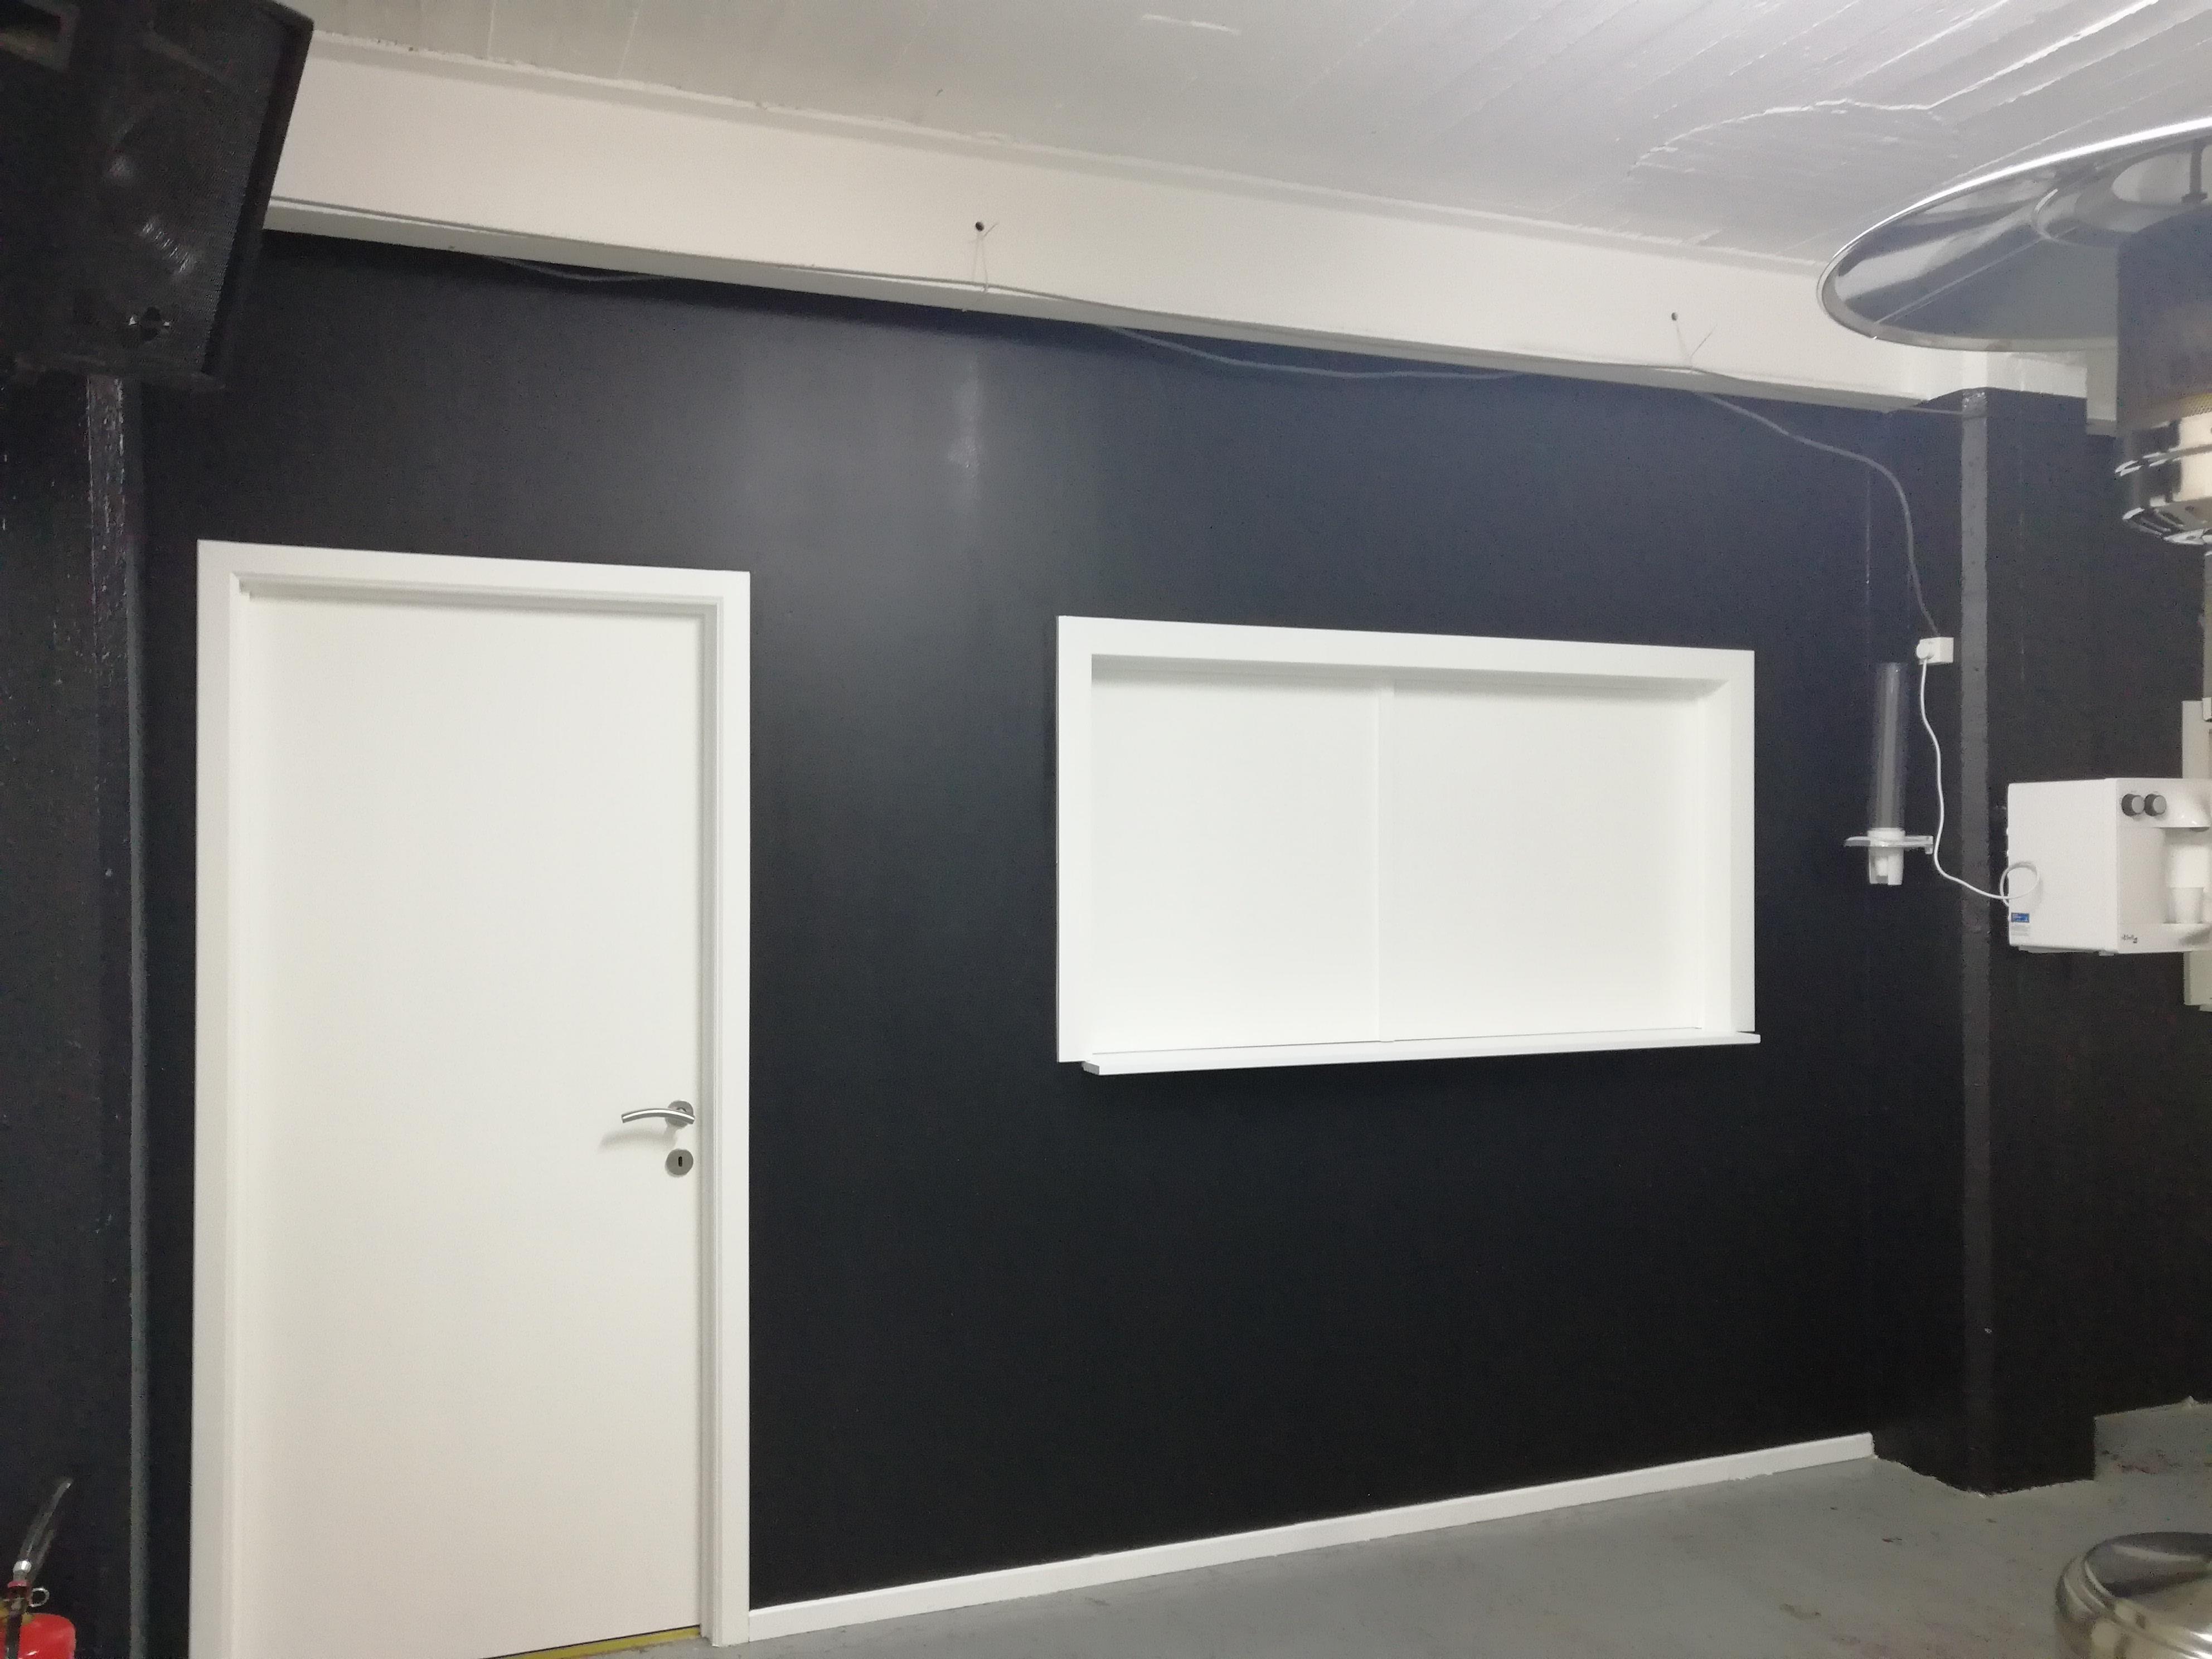 Flay Souza - Remodelações e Pinturas